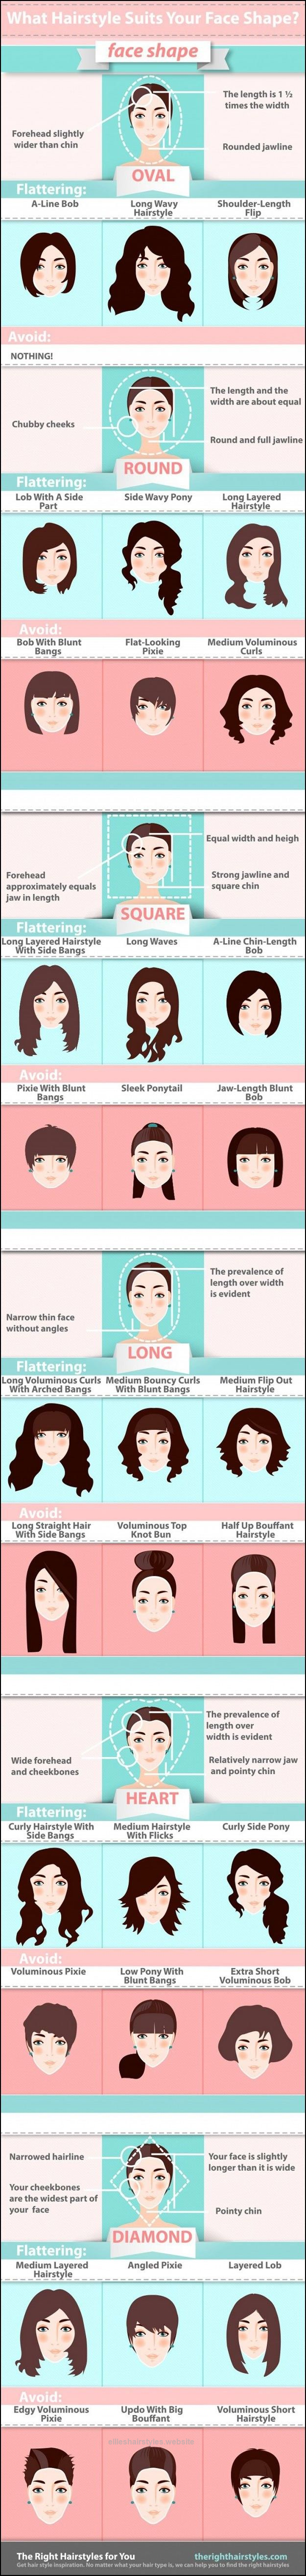 Check Hairstyles On Your Face Hair Pinterest Hair Styles Hair